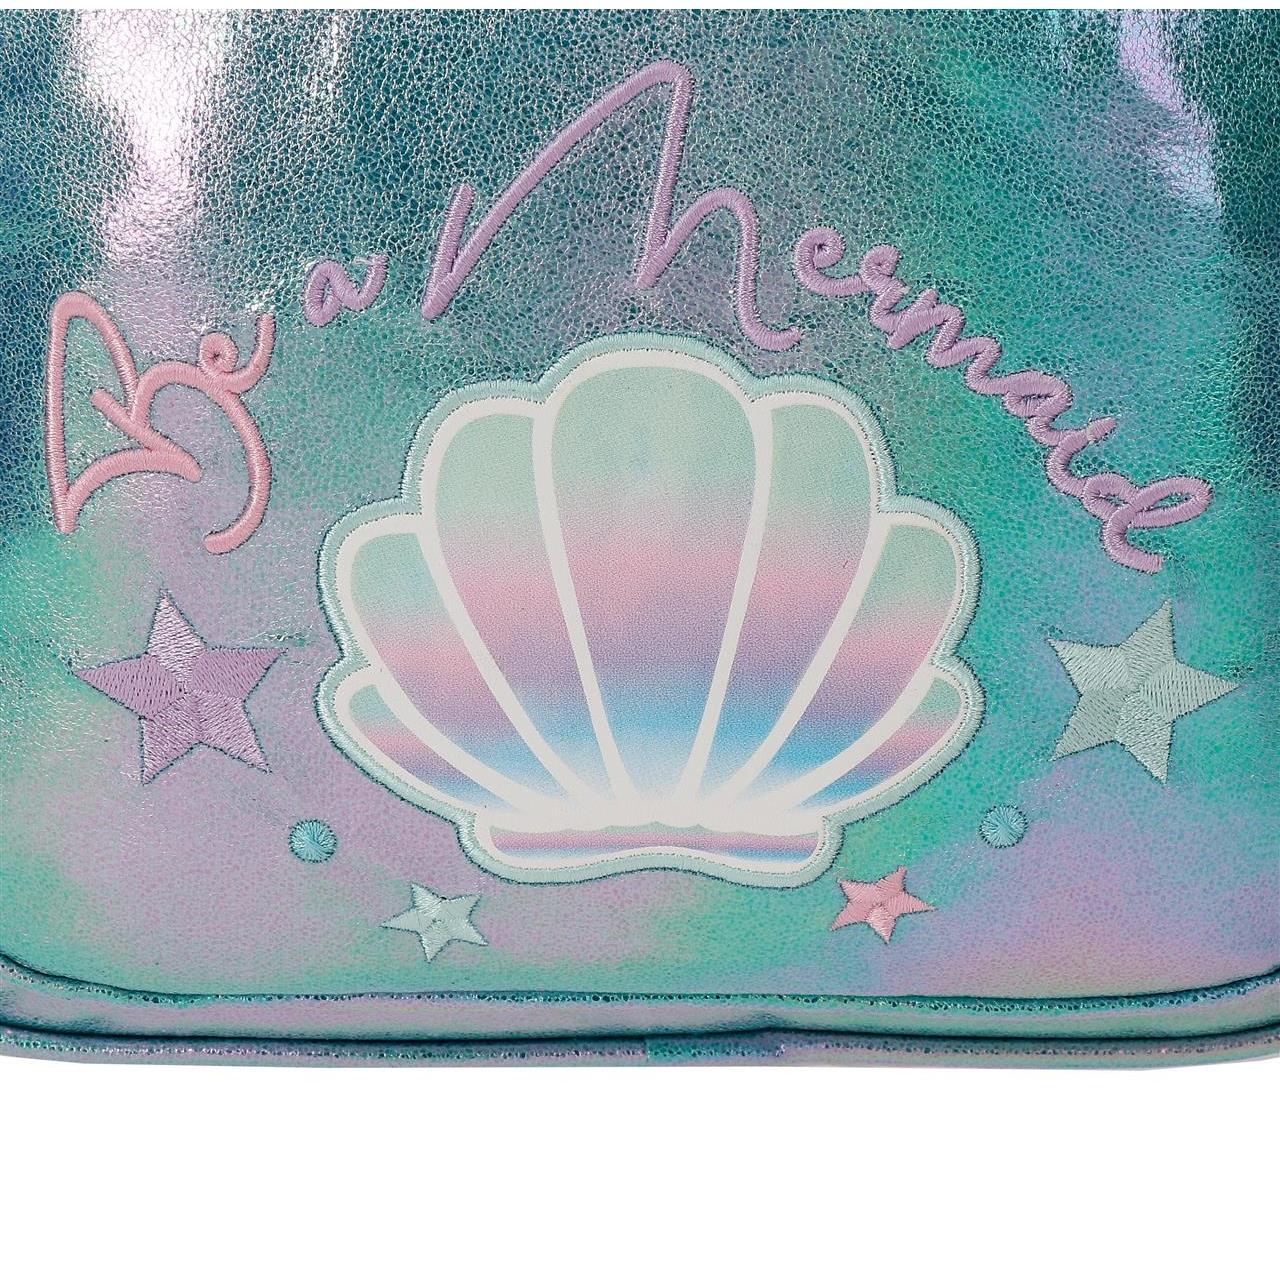 Mochila Portaordenador Enso Be a Mermaid con Carro